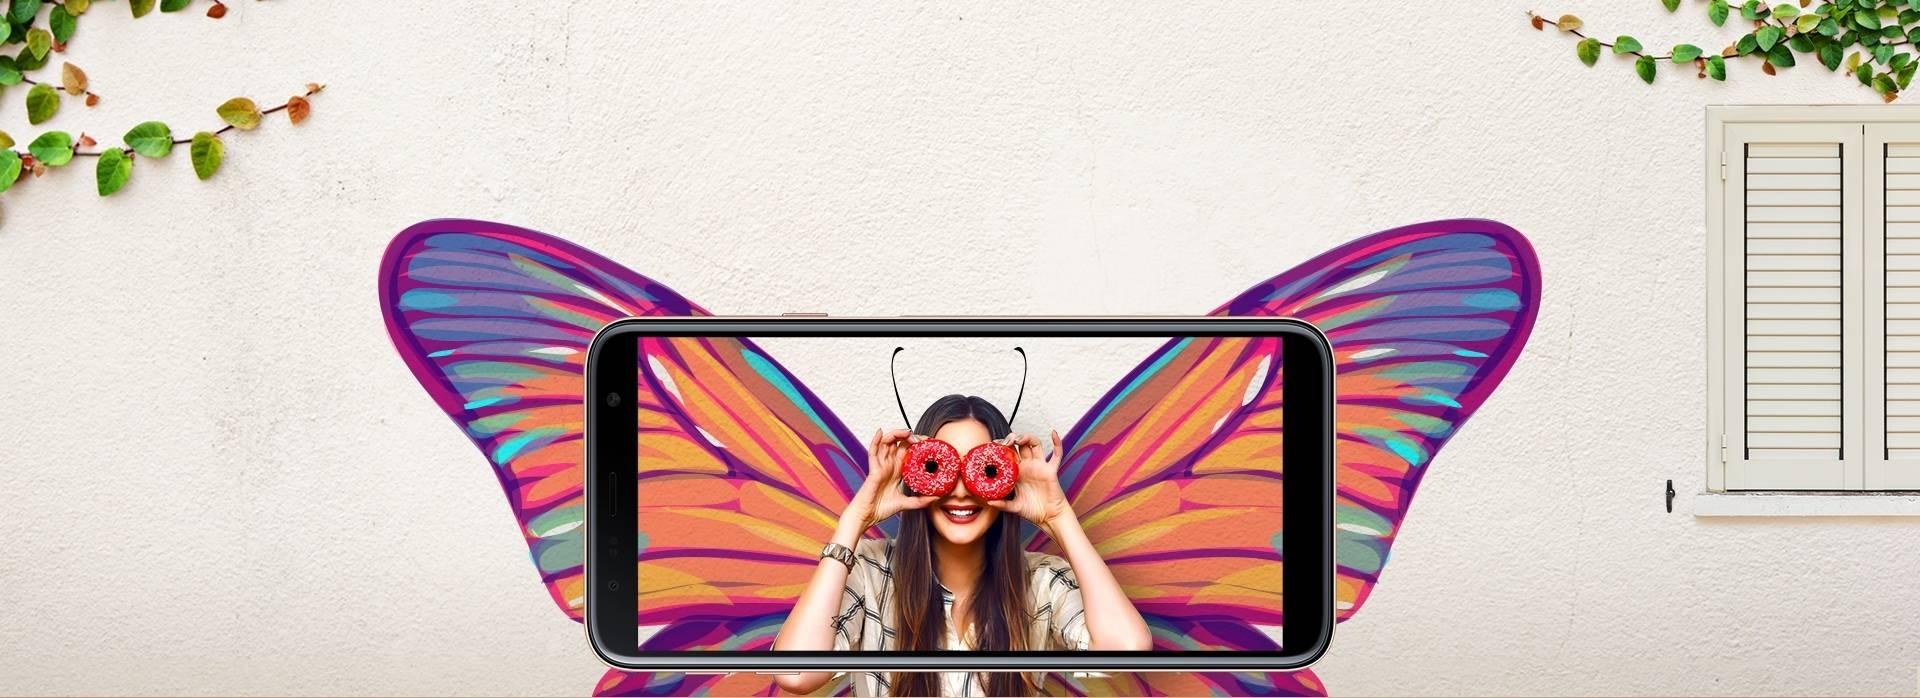 Infinity Display - Samsung Galaxy J4+